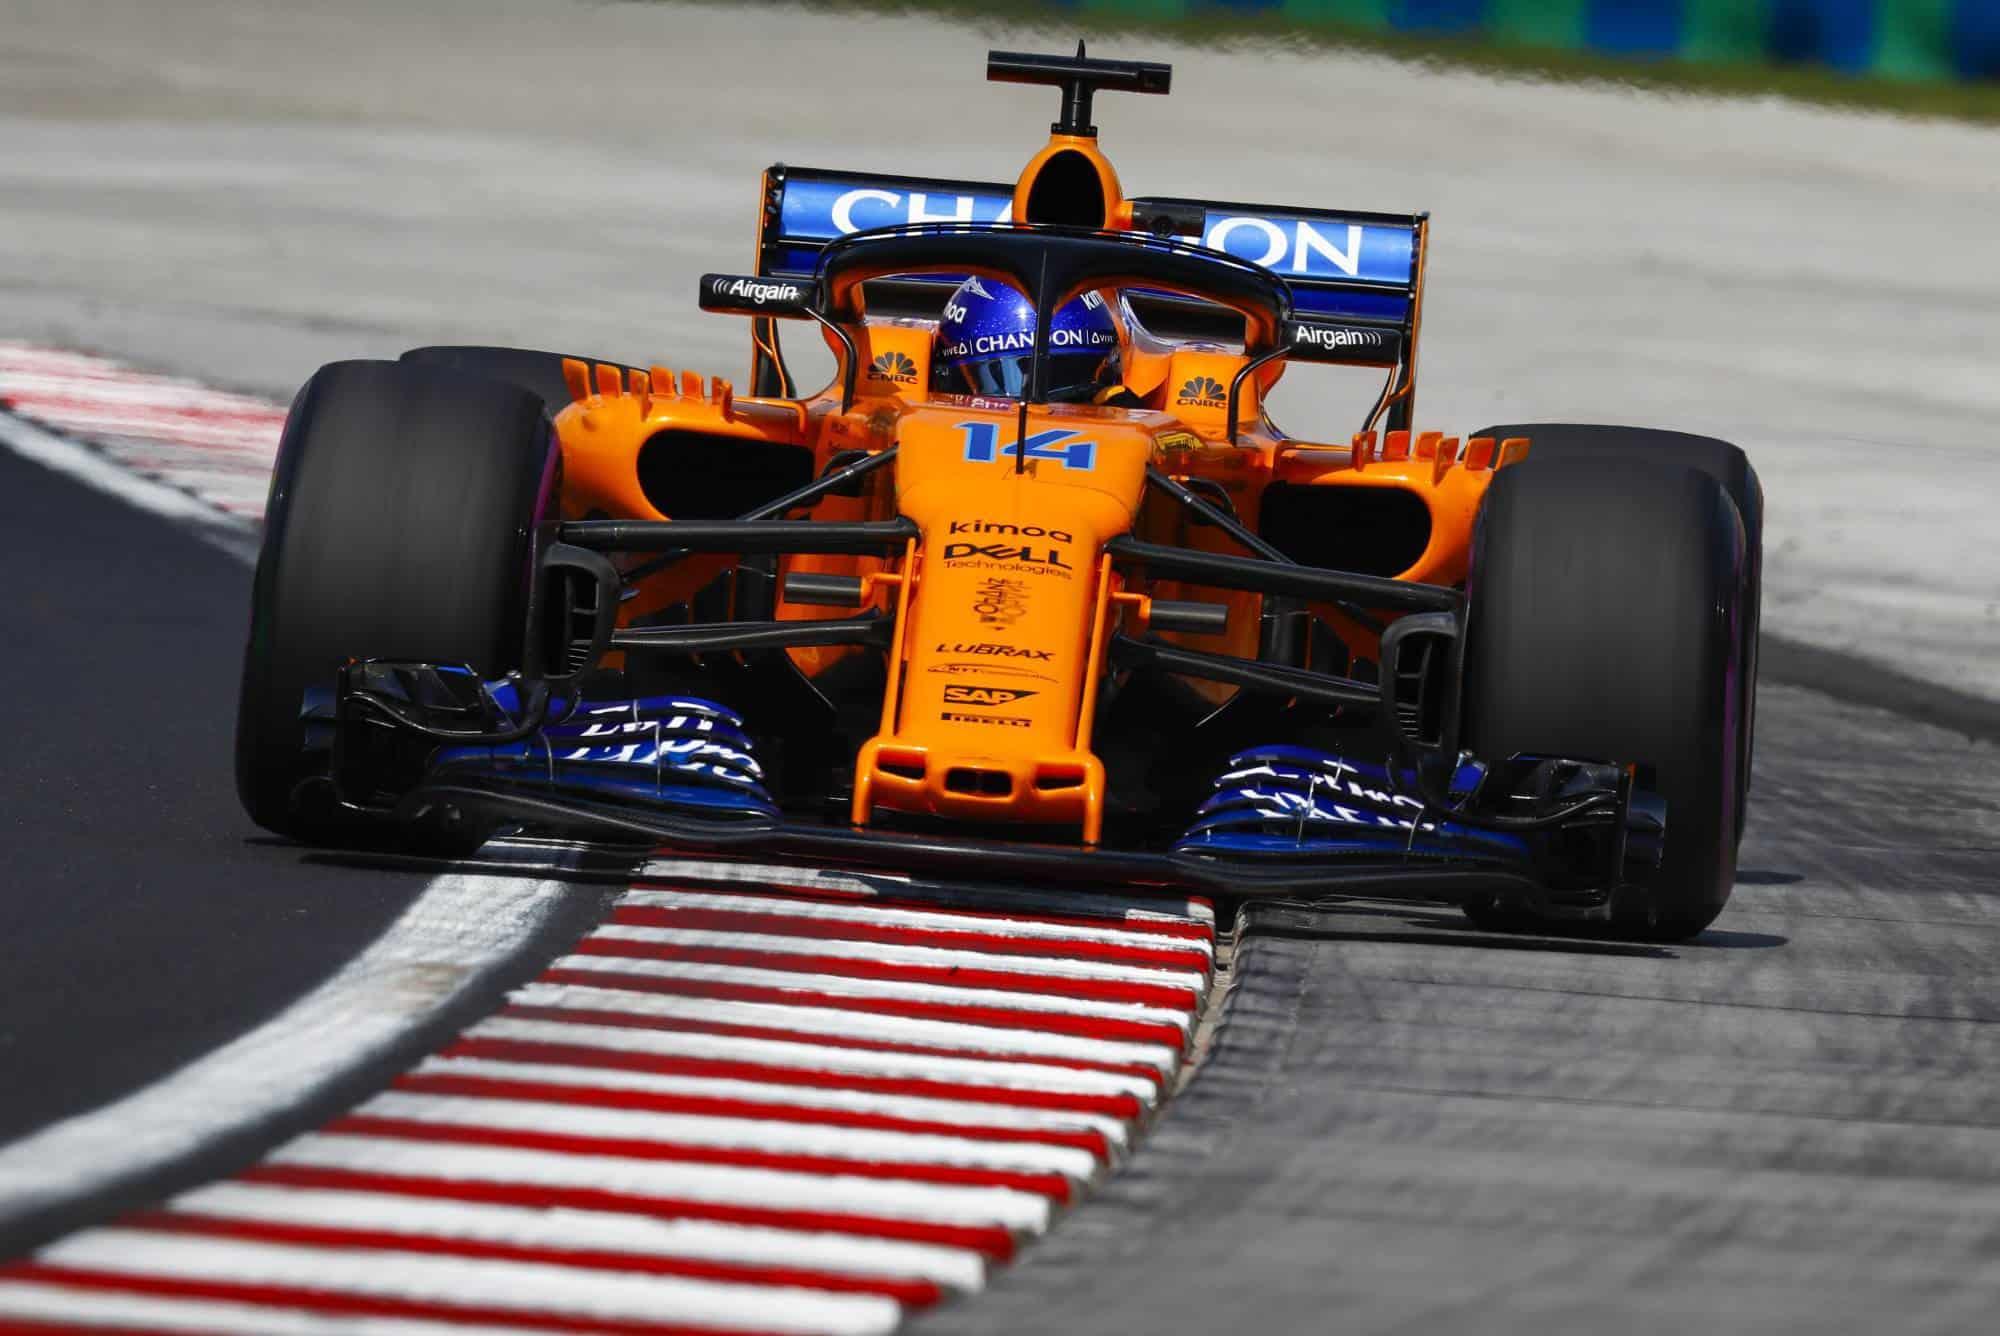 Fernando Alonso McLaren Hungarian GP F1 2018 Photo McLaren